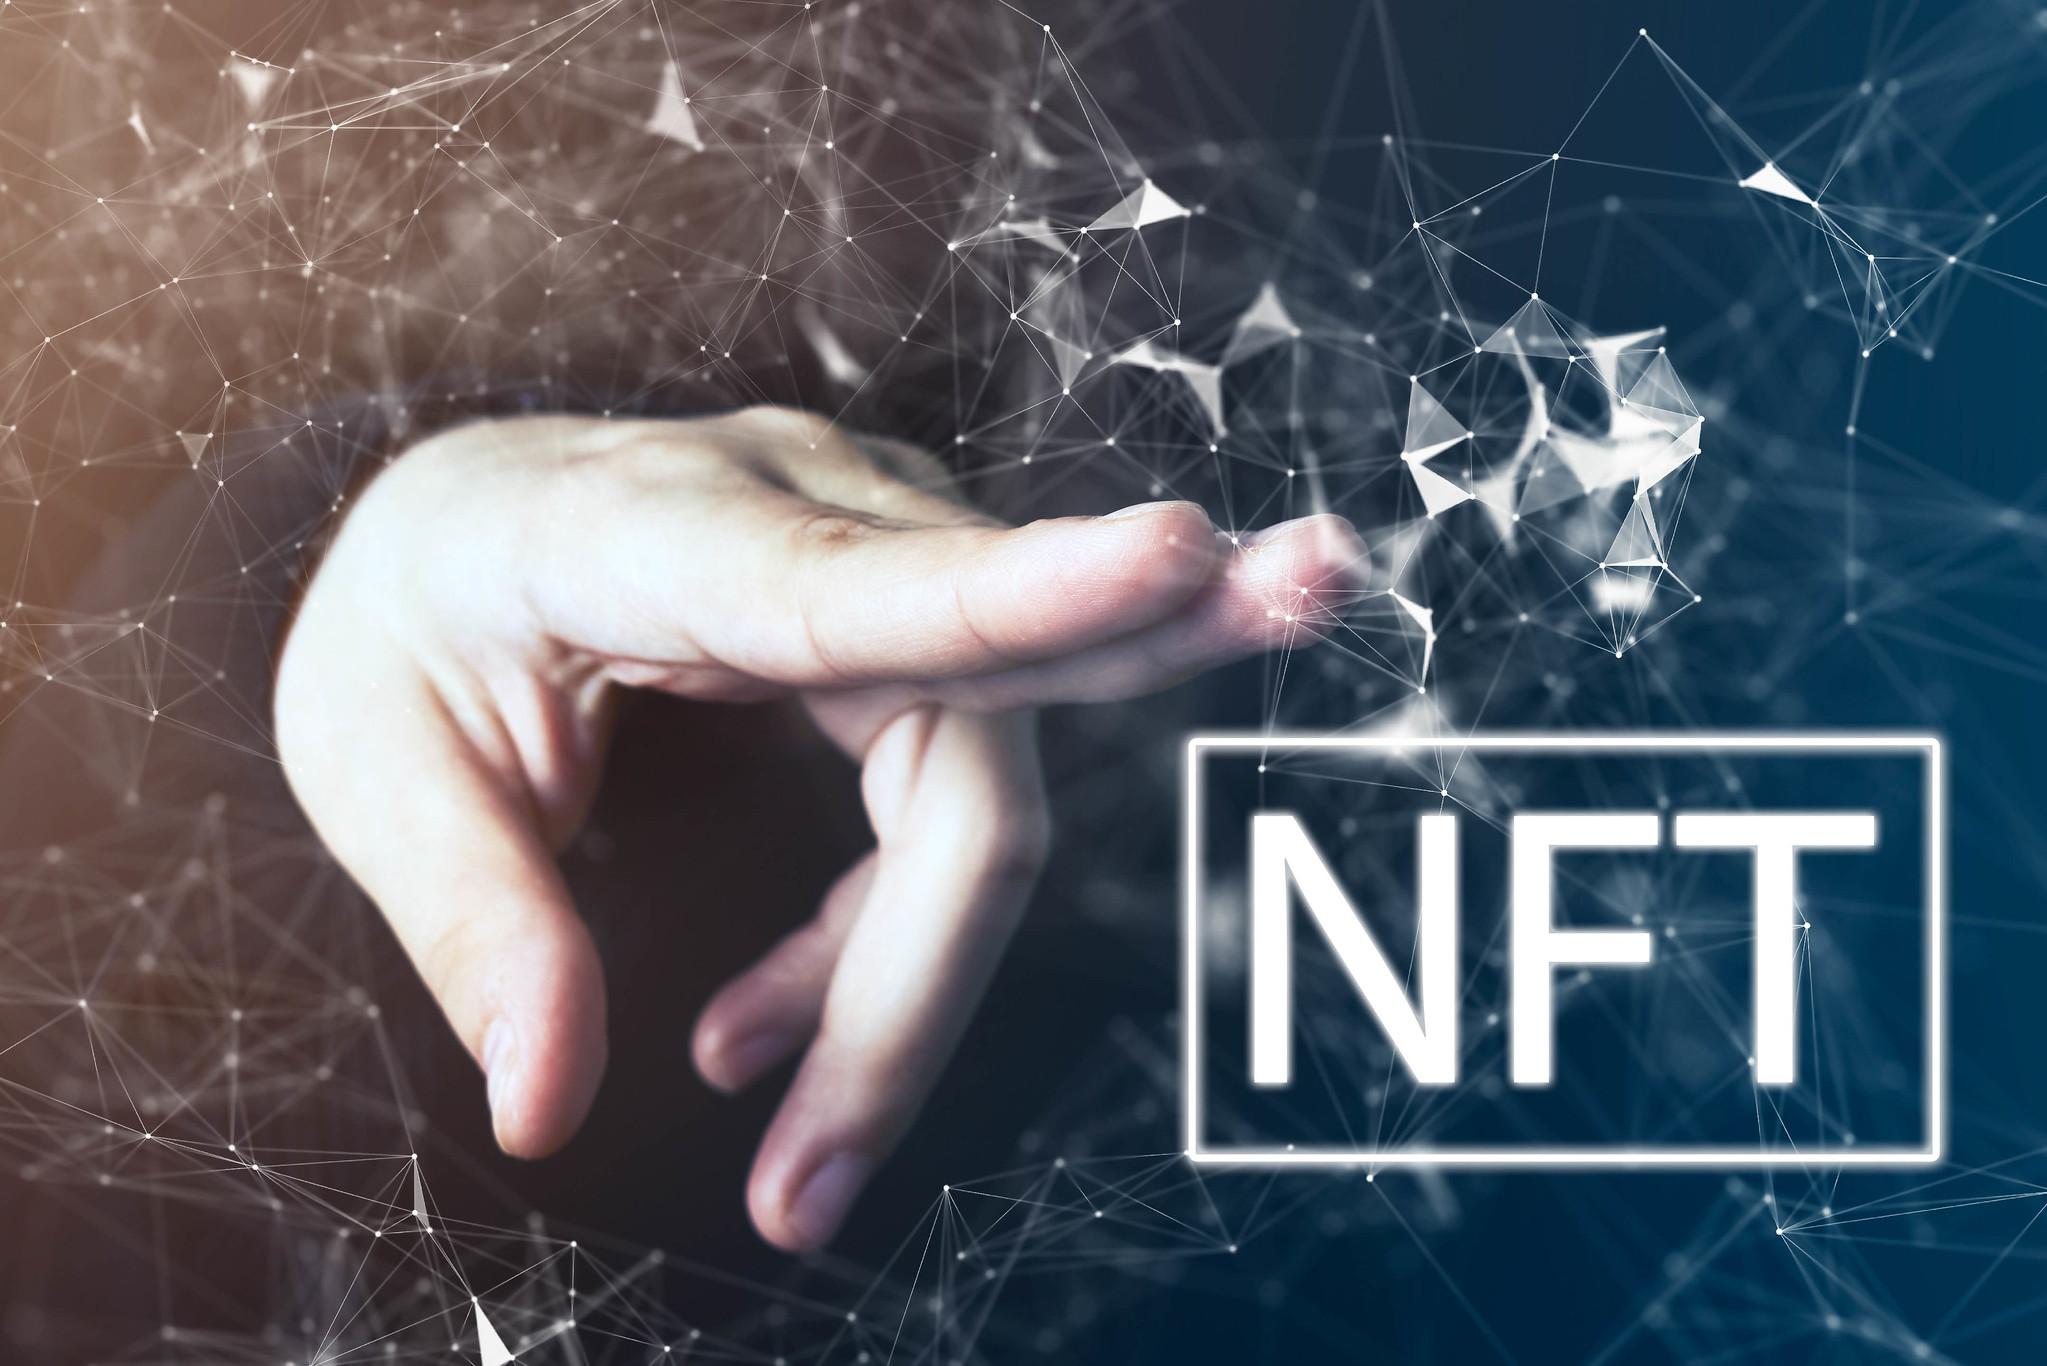 NFT news: Fantasy football game raises $680 Million led by Softbank